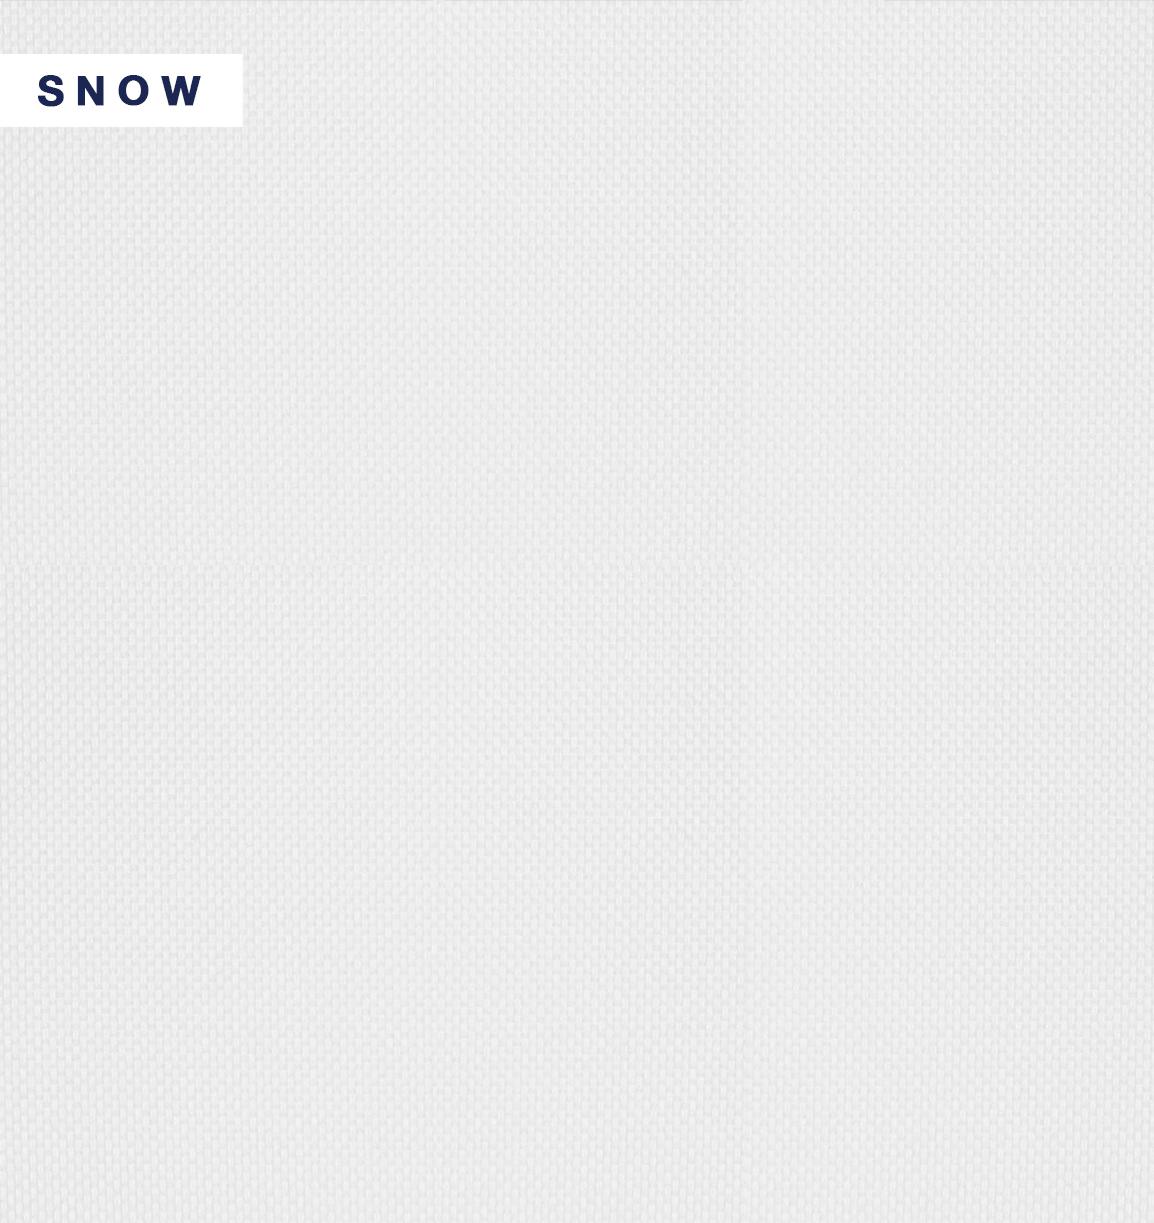 Phoenix - Snow.jpg